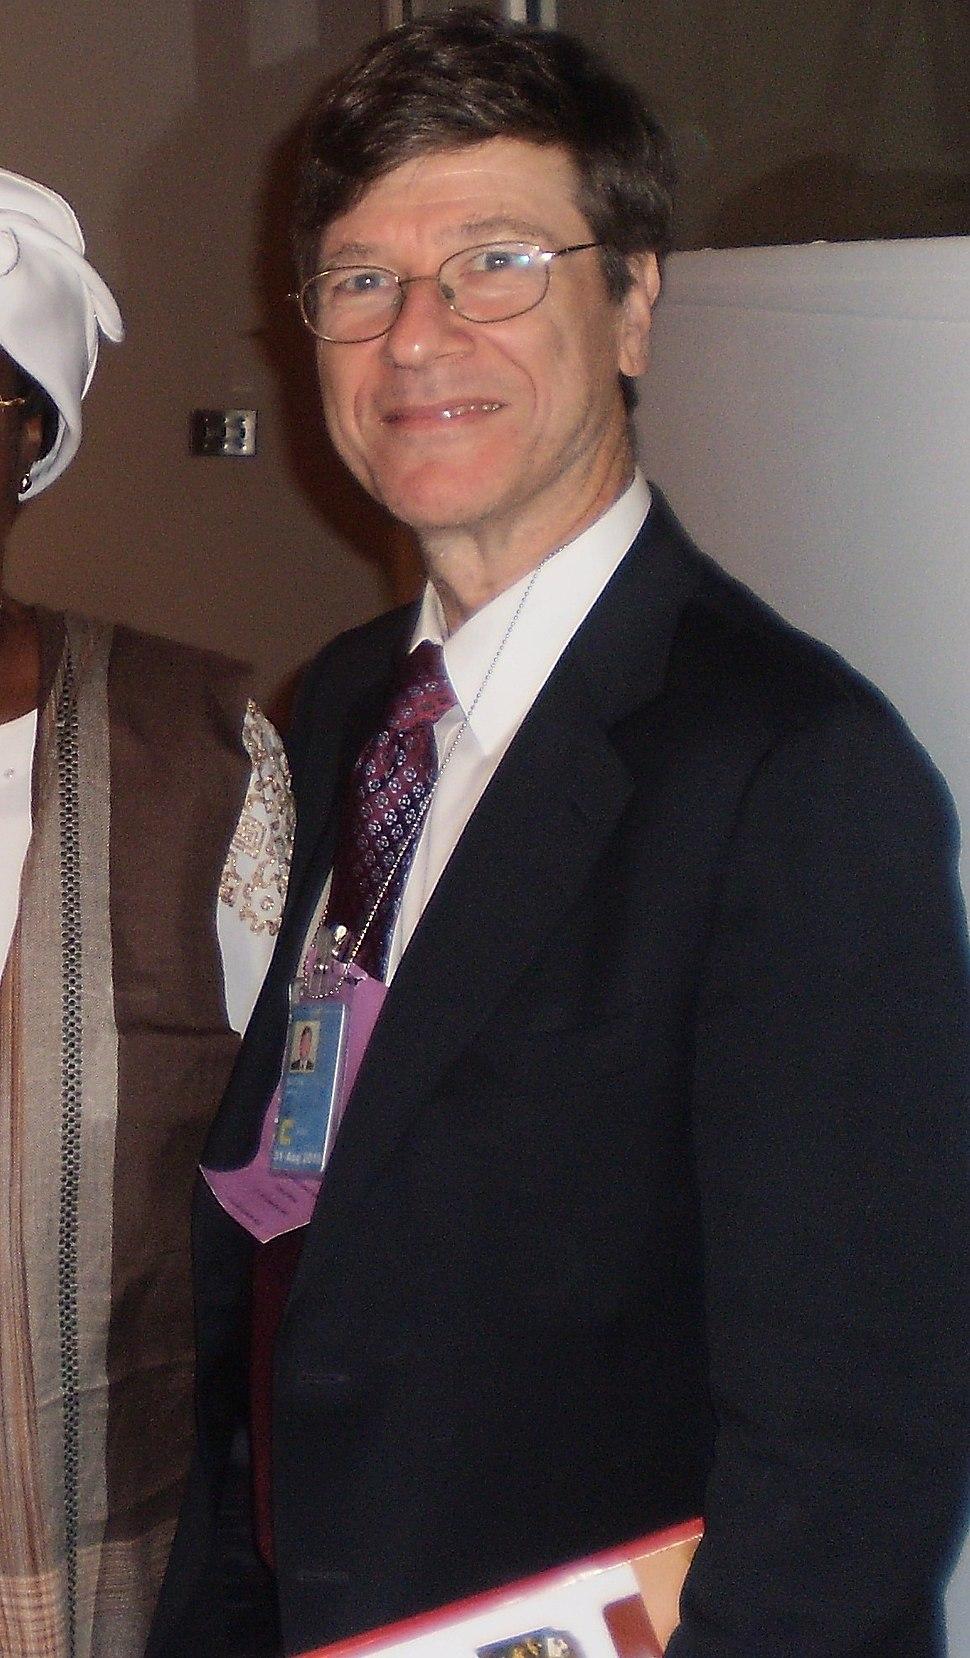 Sachs at UN